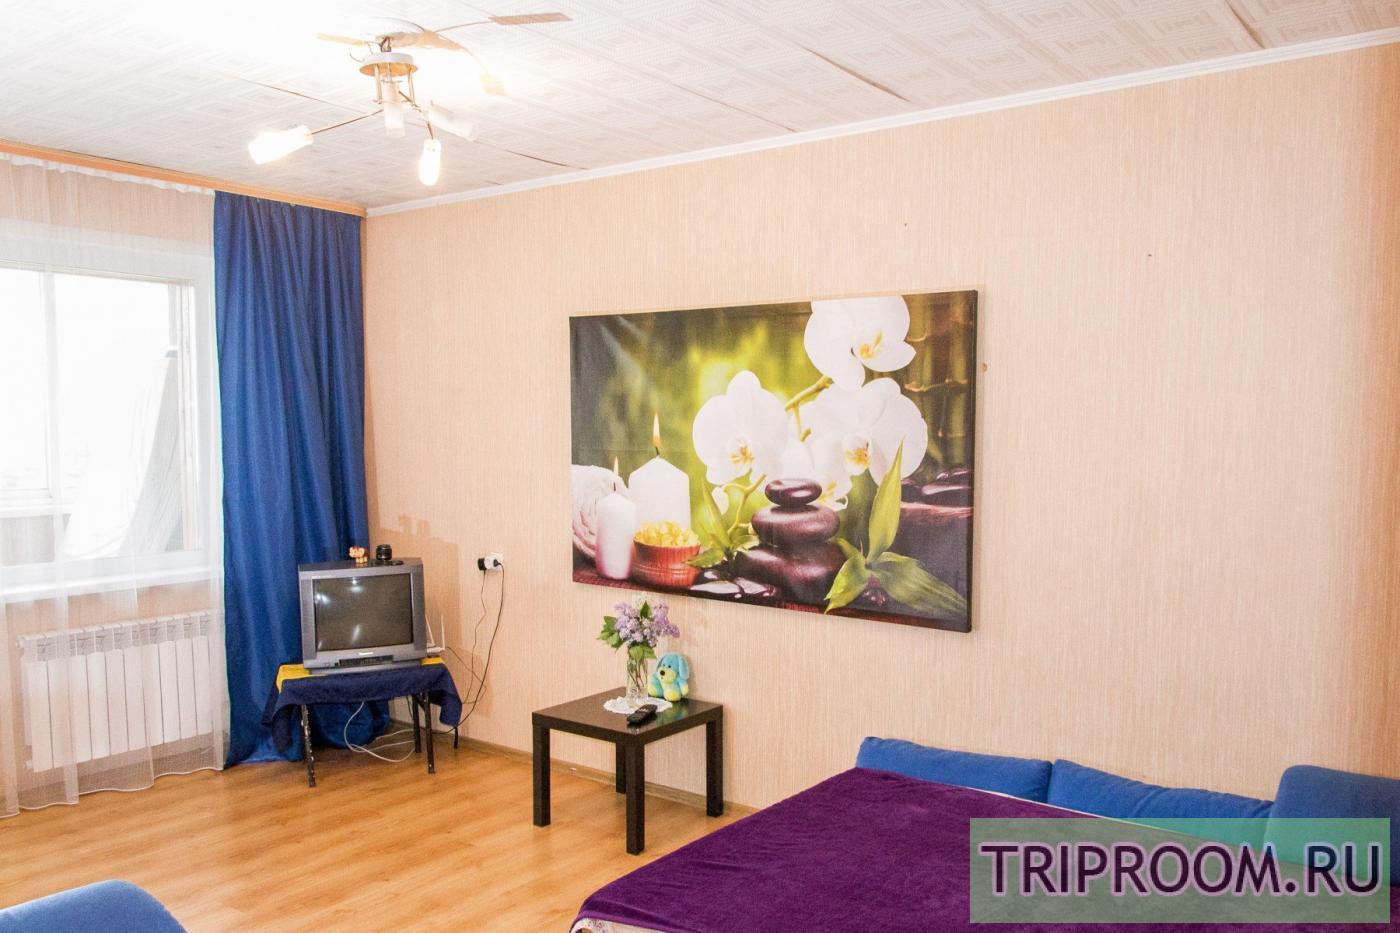 1-комнатная квартира посуточно (вариант № 21406), ул. Стаханова улица, фото № 3